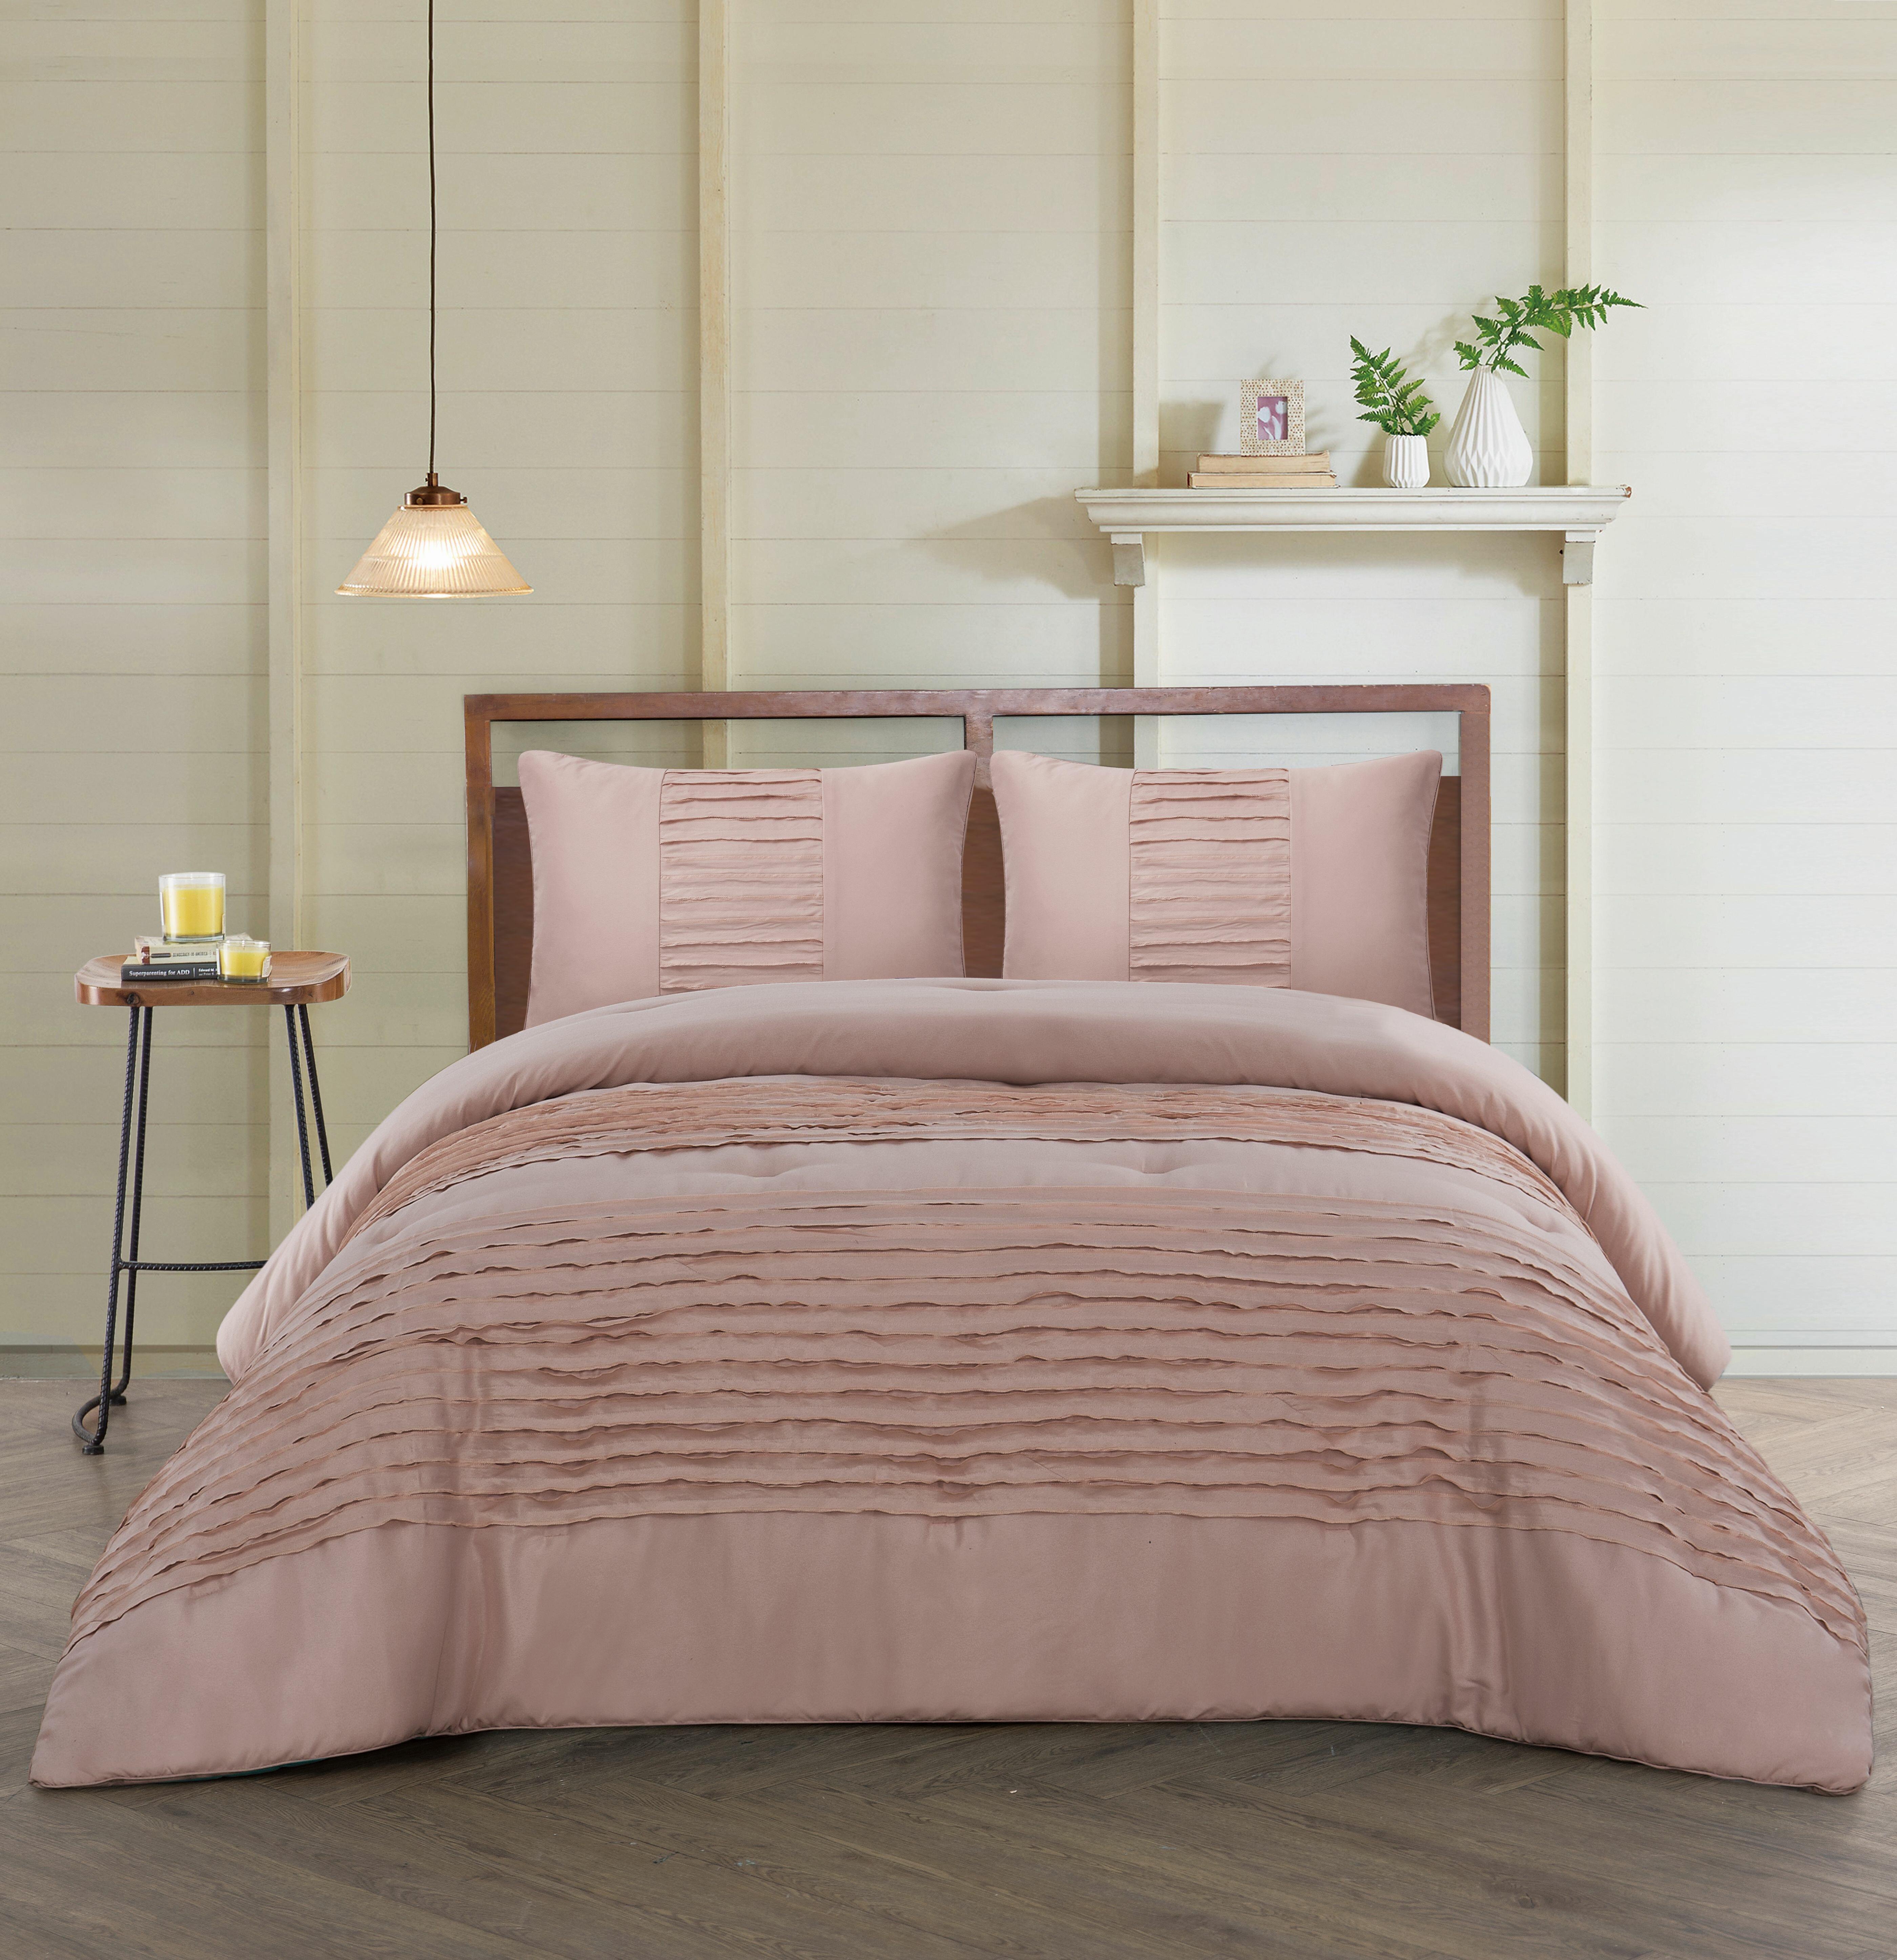 comforter carousel gray and classic duvet herringbone large cloud designs cover white